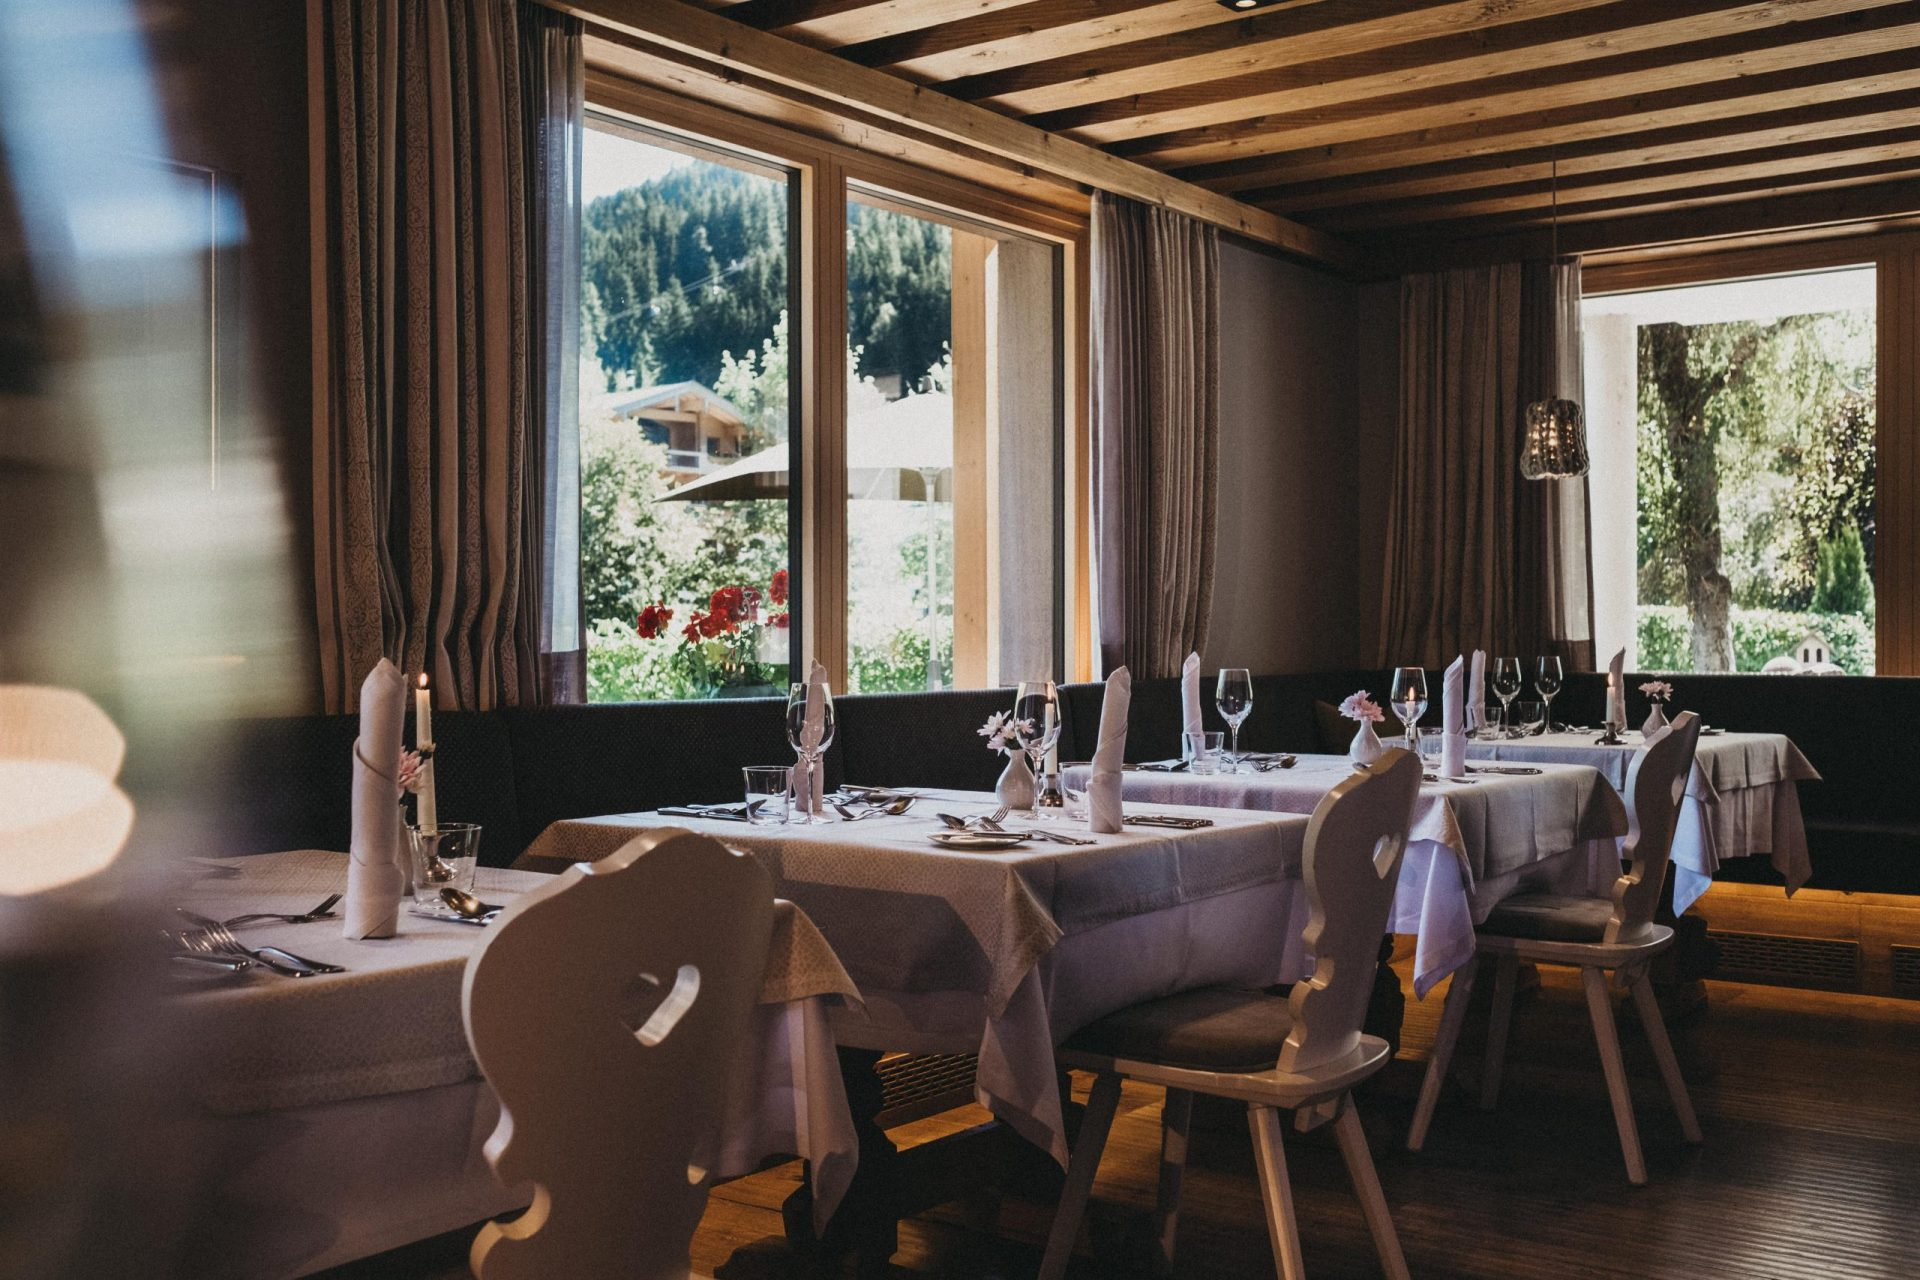 Restaurant Biohotel Rupertus